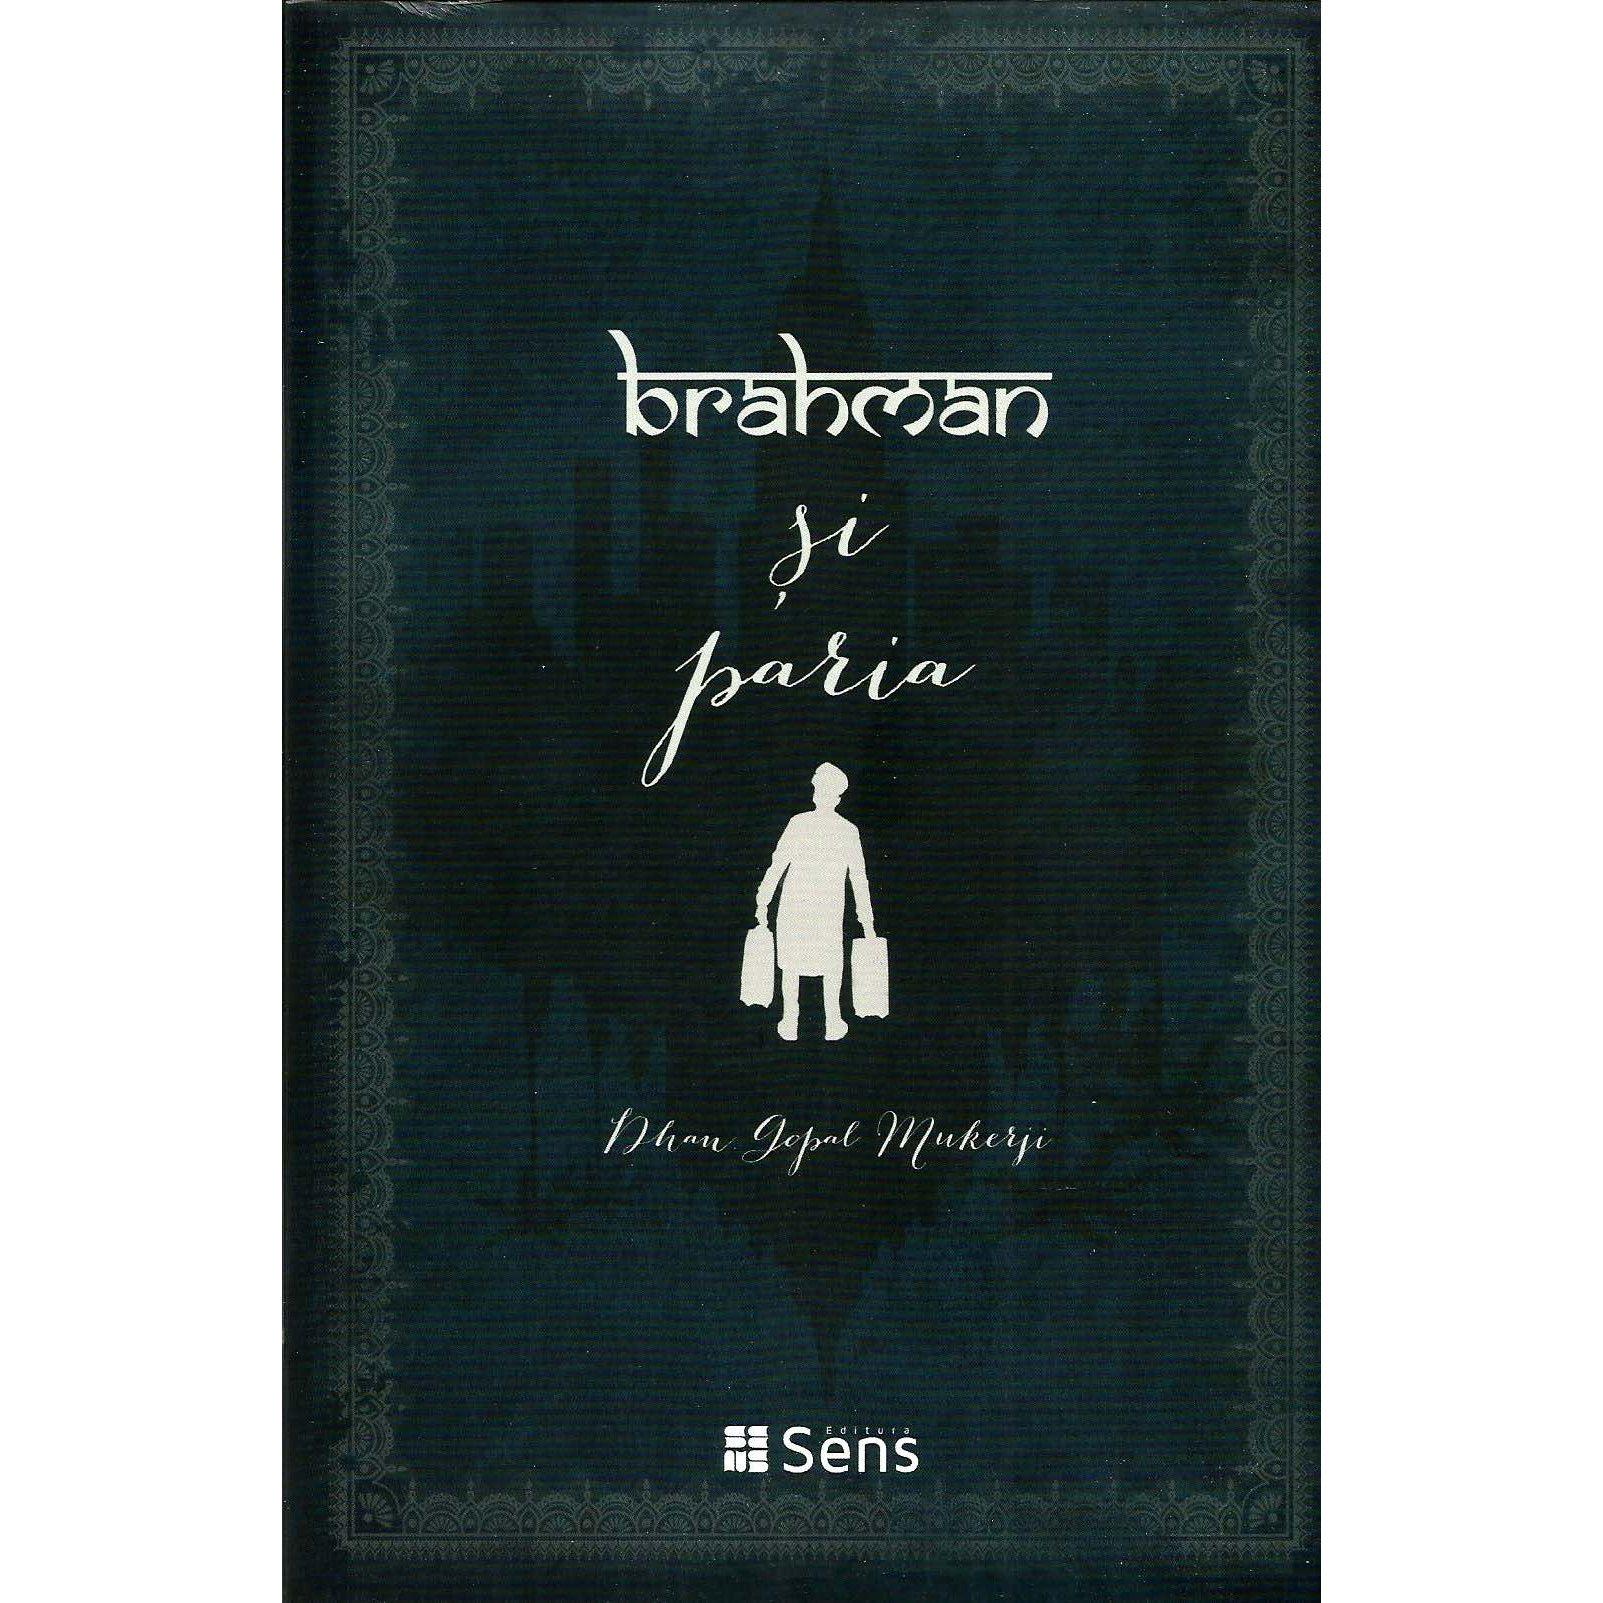 Brahman si Paria | Dhan Gopal Mukerji